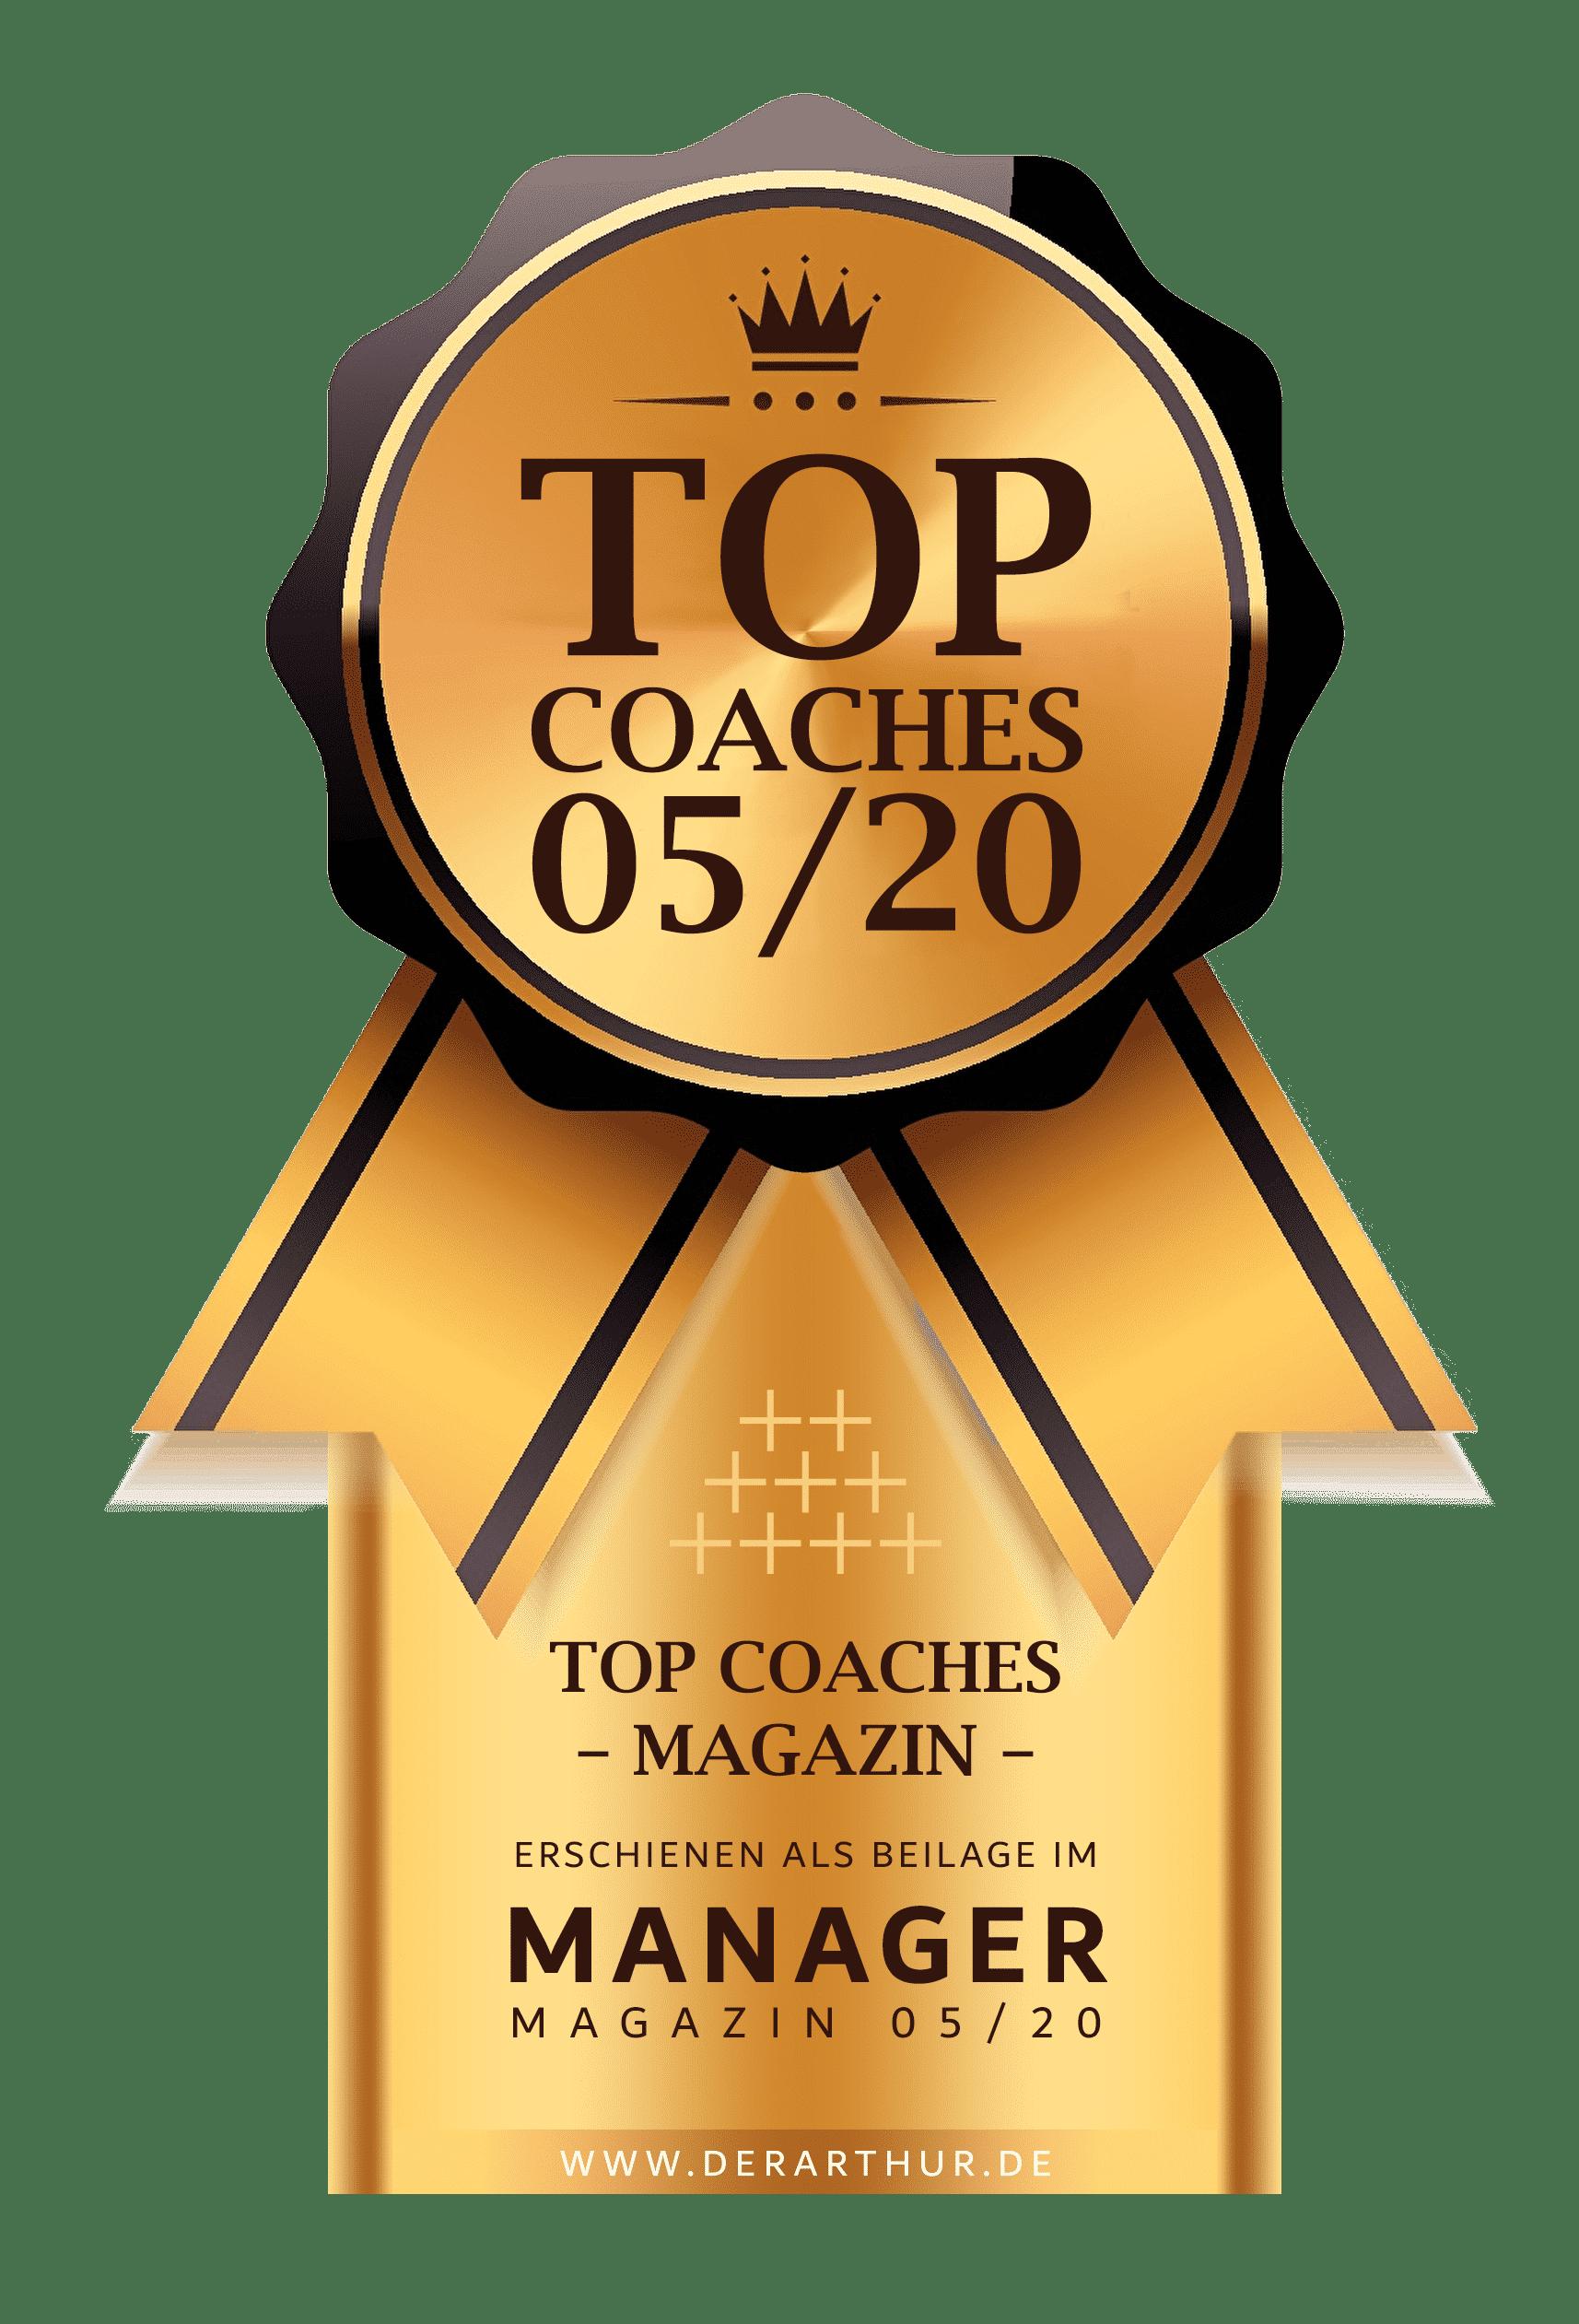 Siegel Top Coaches 05 20 min Finest Audience by Dawid Przybylski - Facebook Marketing - Instagram Marketing